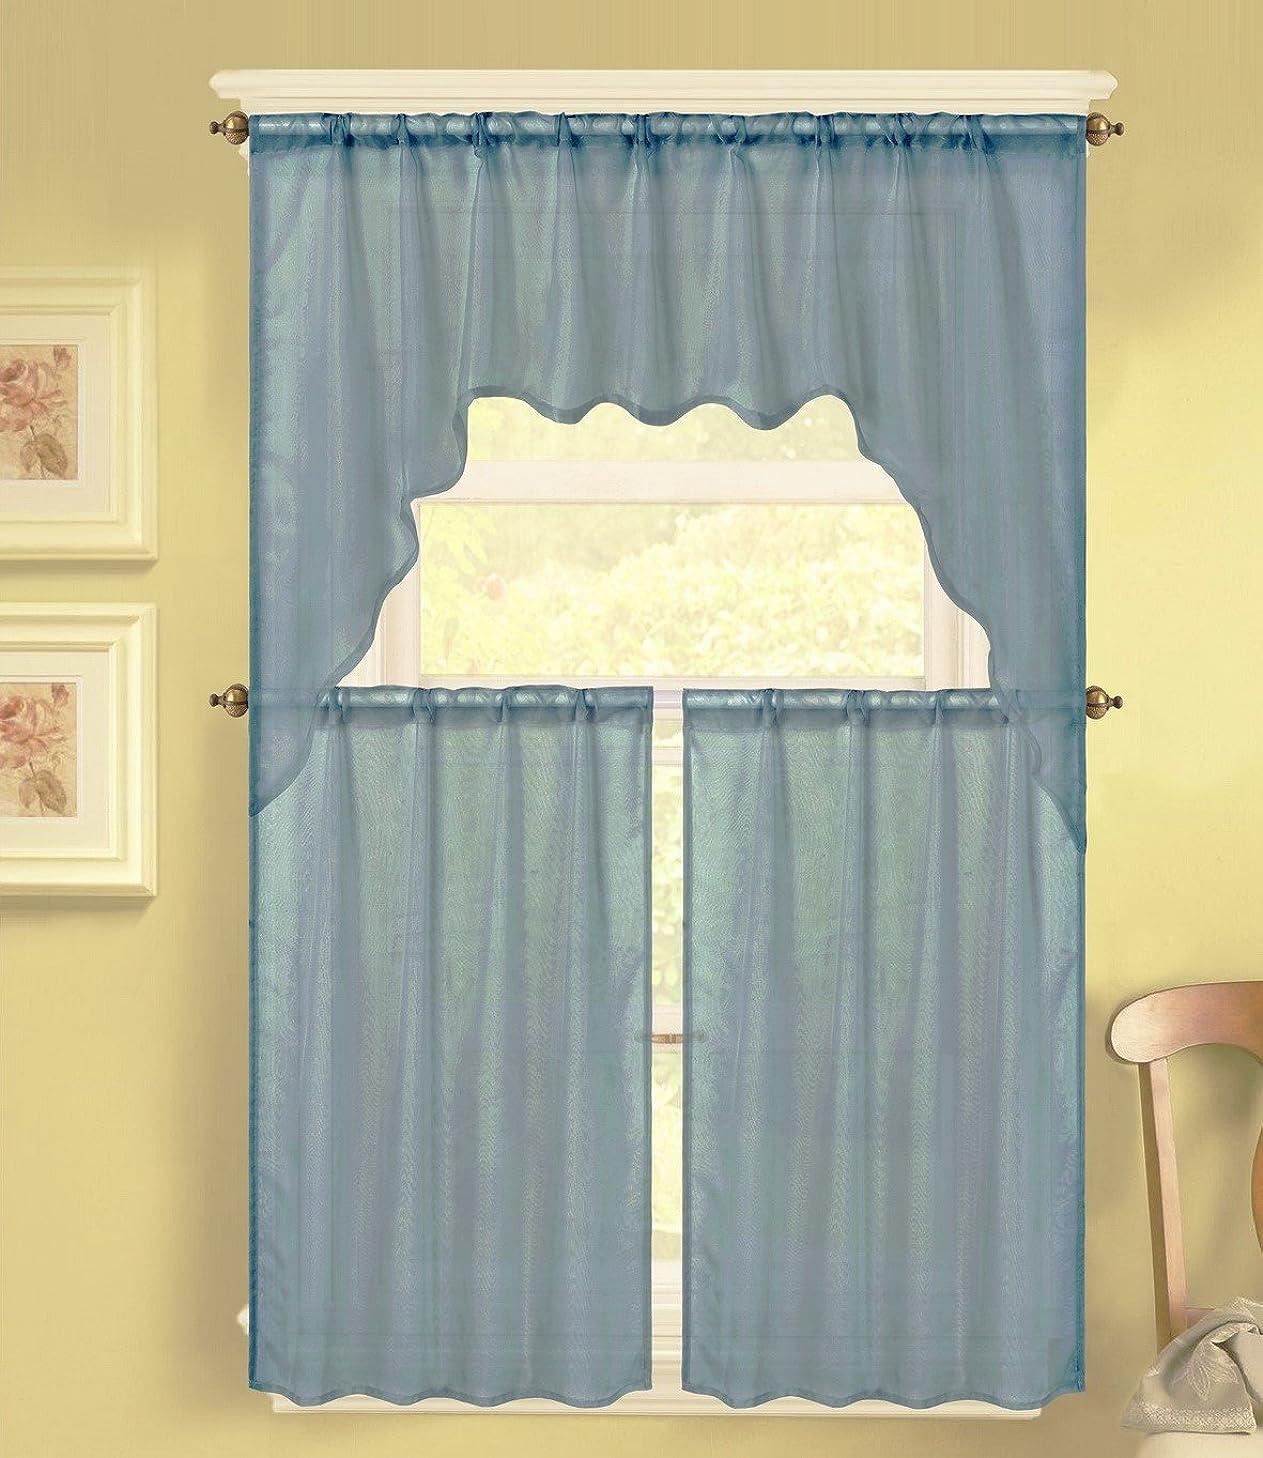 GorgeousHomeLinen (K66) 3 PC Solid Voile Rod Pocket Kitchen Window Sheer Curtain Set 2 Tier Panels, 1 Swag Valance (SLATE BLUE)